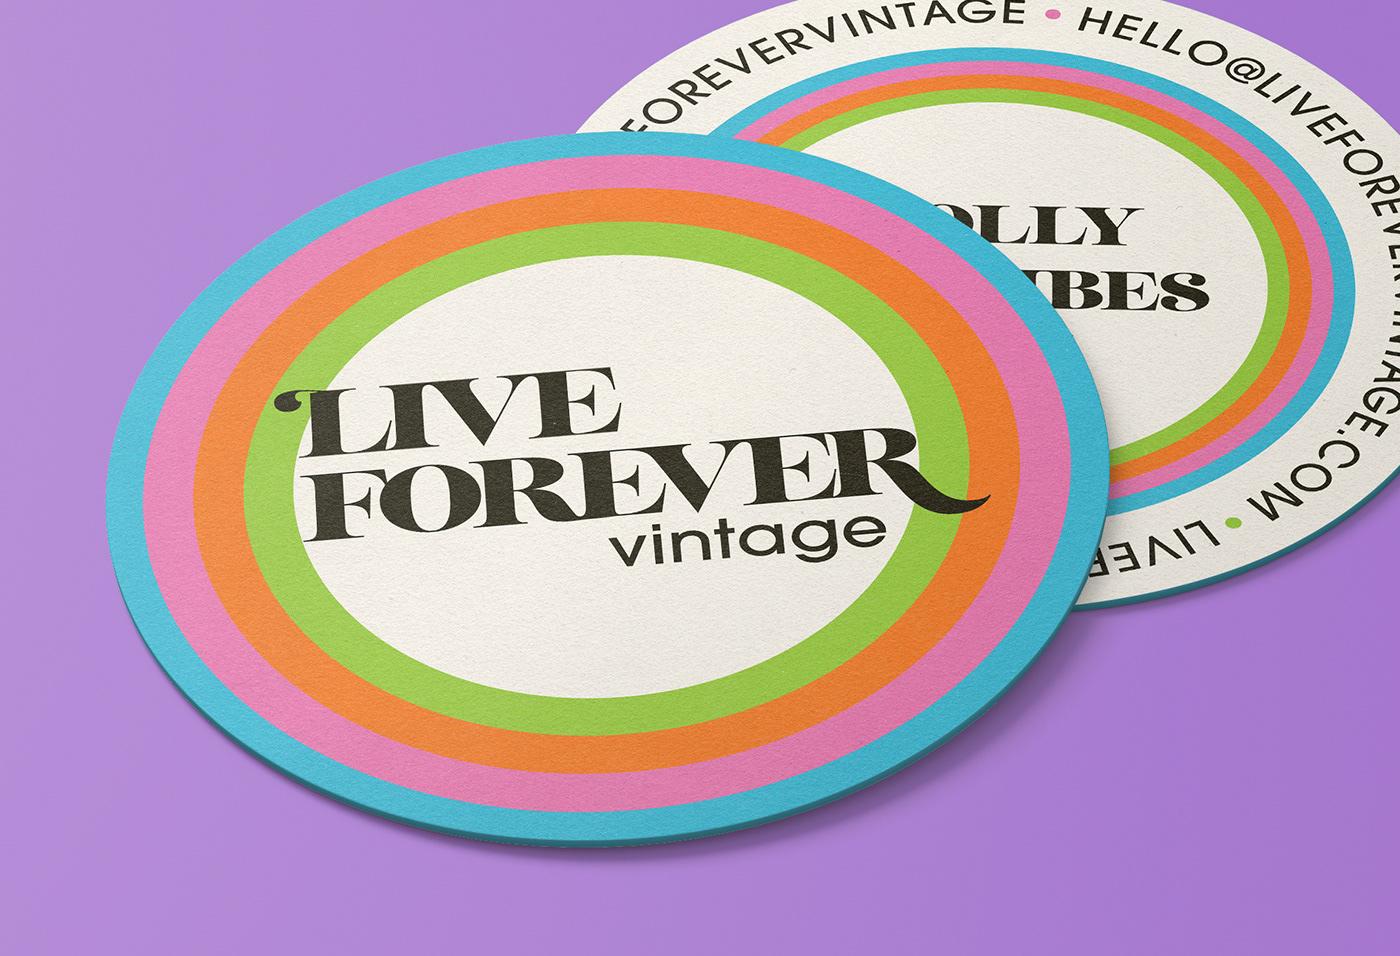 Round Live Forever Vintage business cards